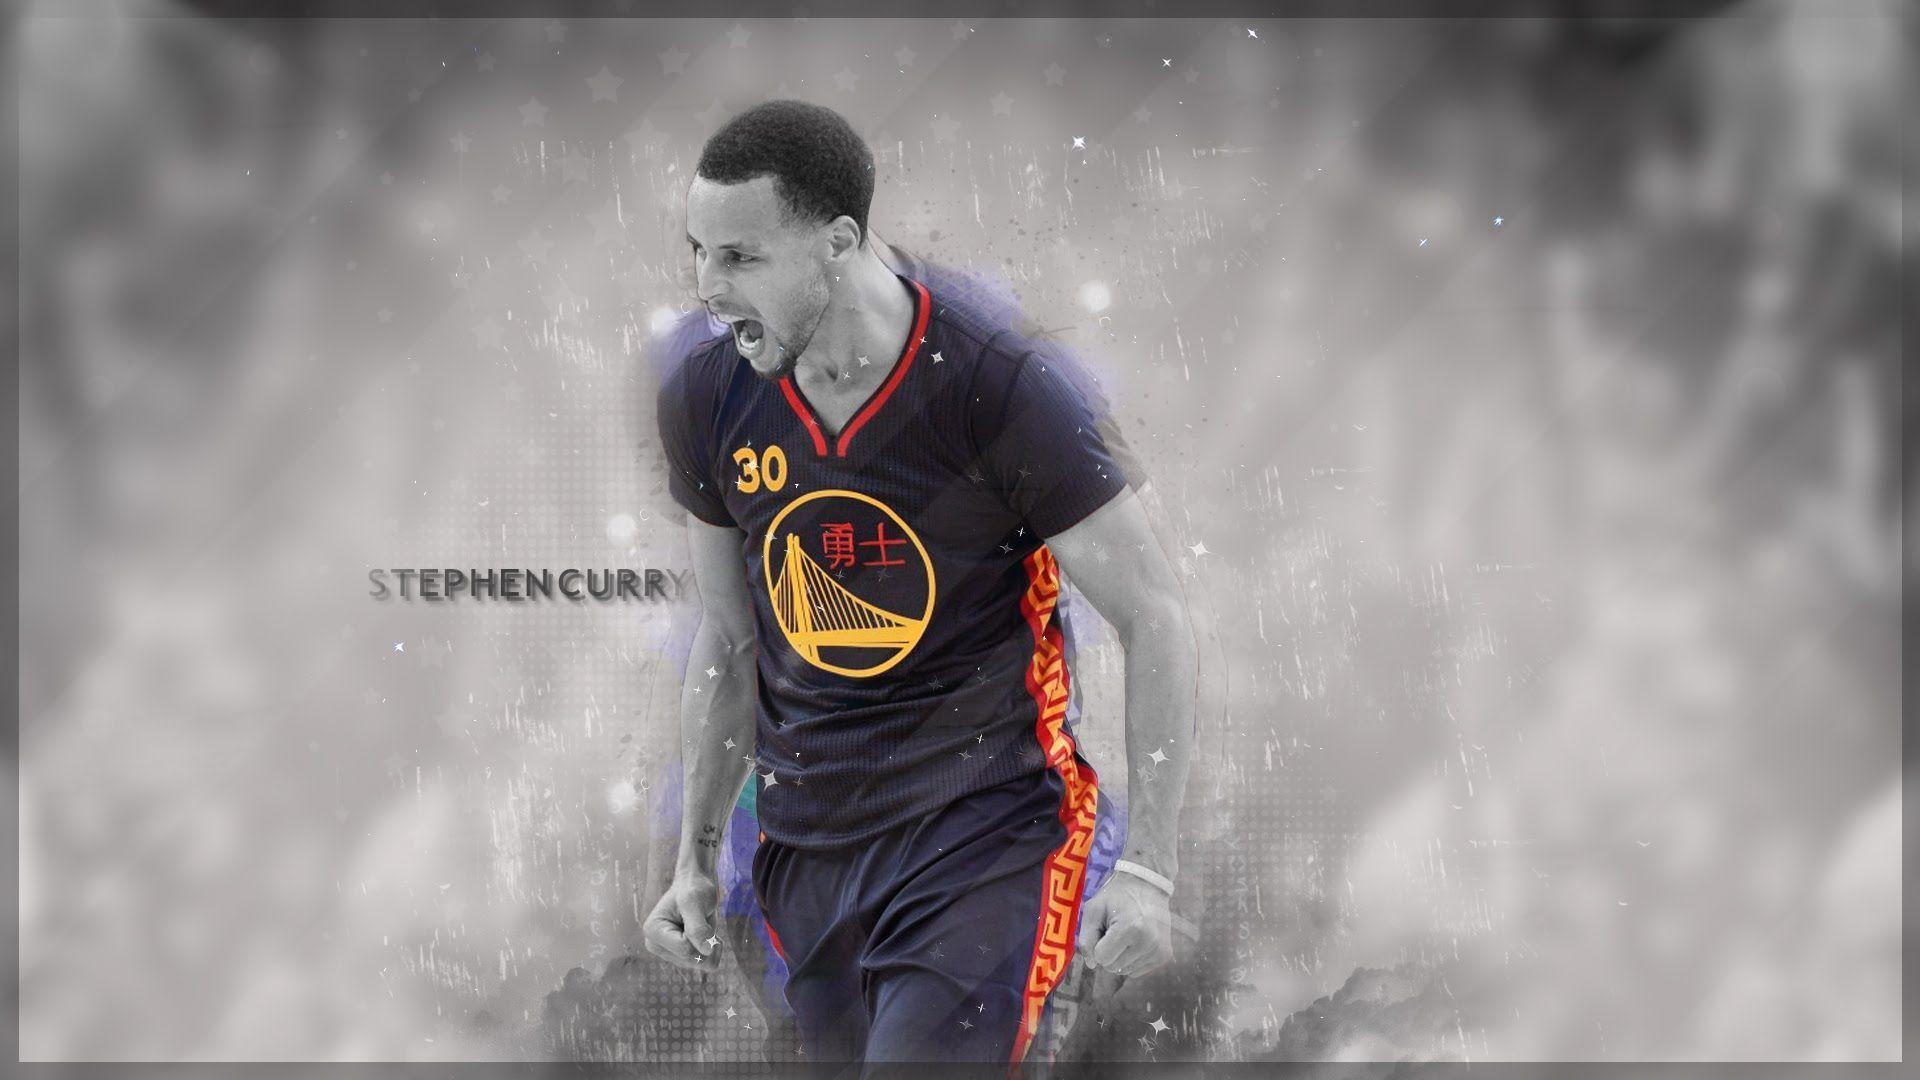 Sport Wallpaper Stephen Curry: Basketball Wallpapers 2016